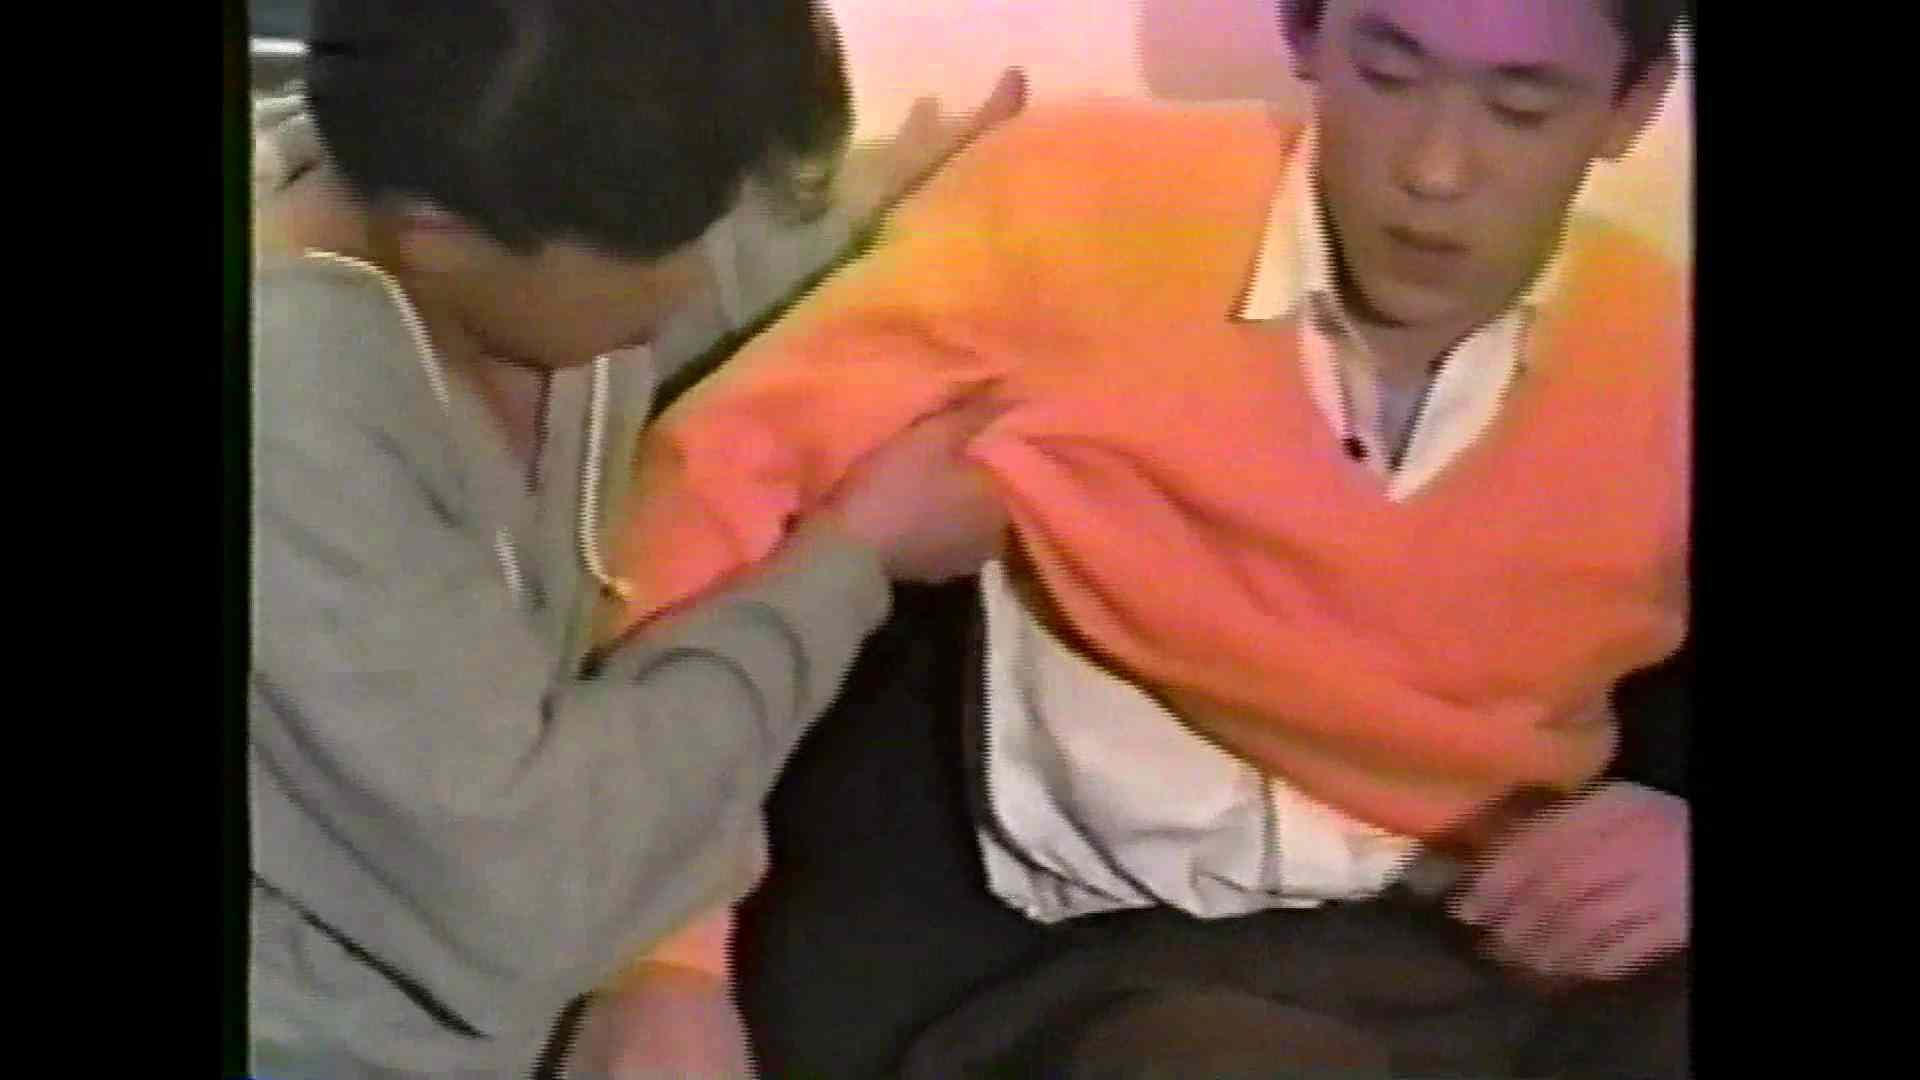 GAYBOY宏のオカズ倉庫Vol.2-1 ゲイのペニス ペニス画像 68枚 30